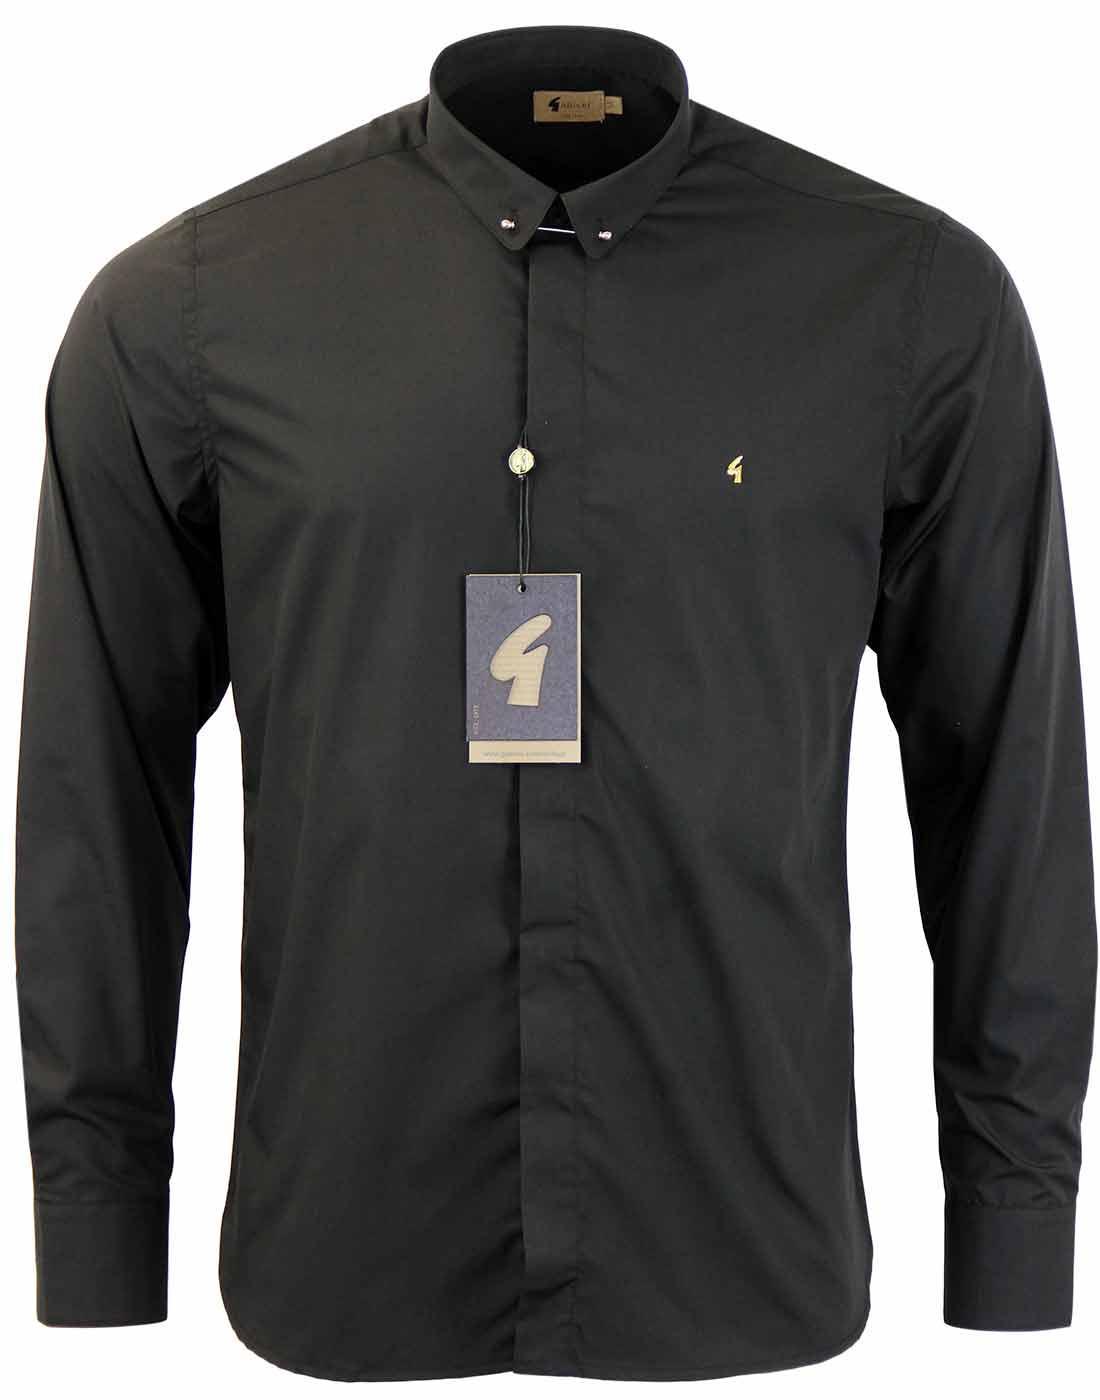 GABICCI VINTAGE Retro 60s Mod Bar Collar Shirt (B)